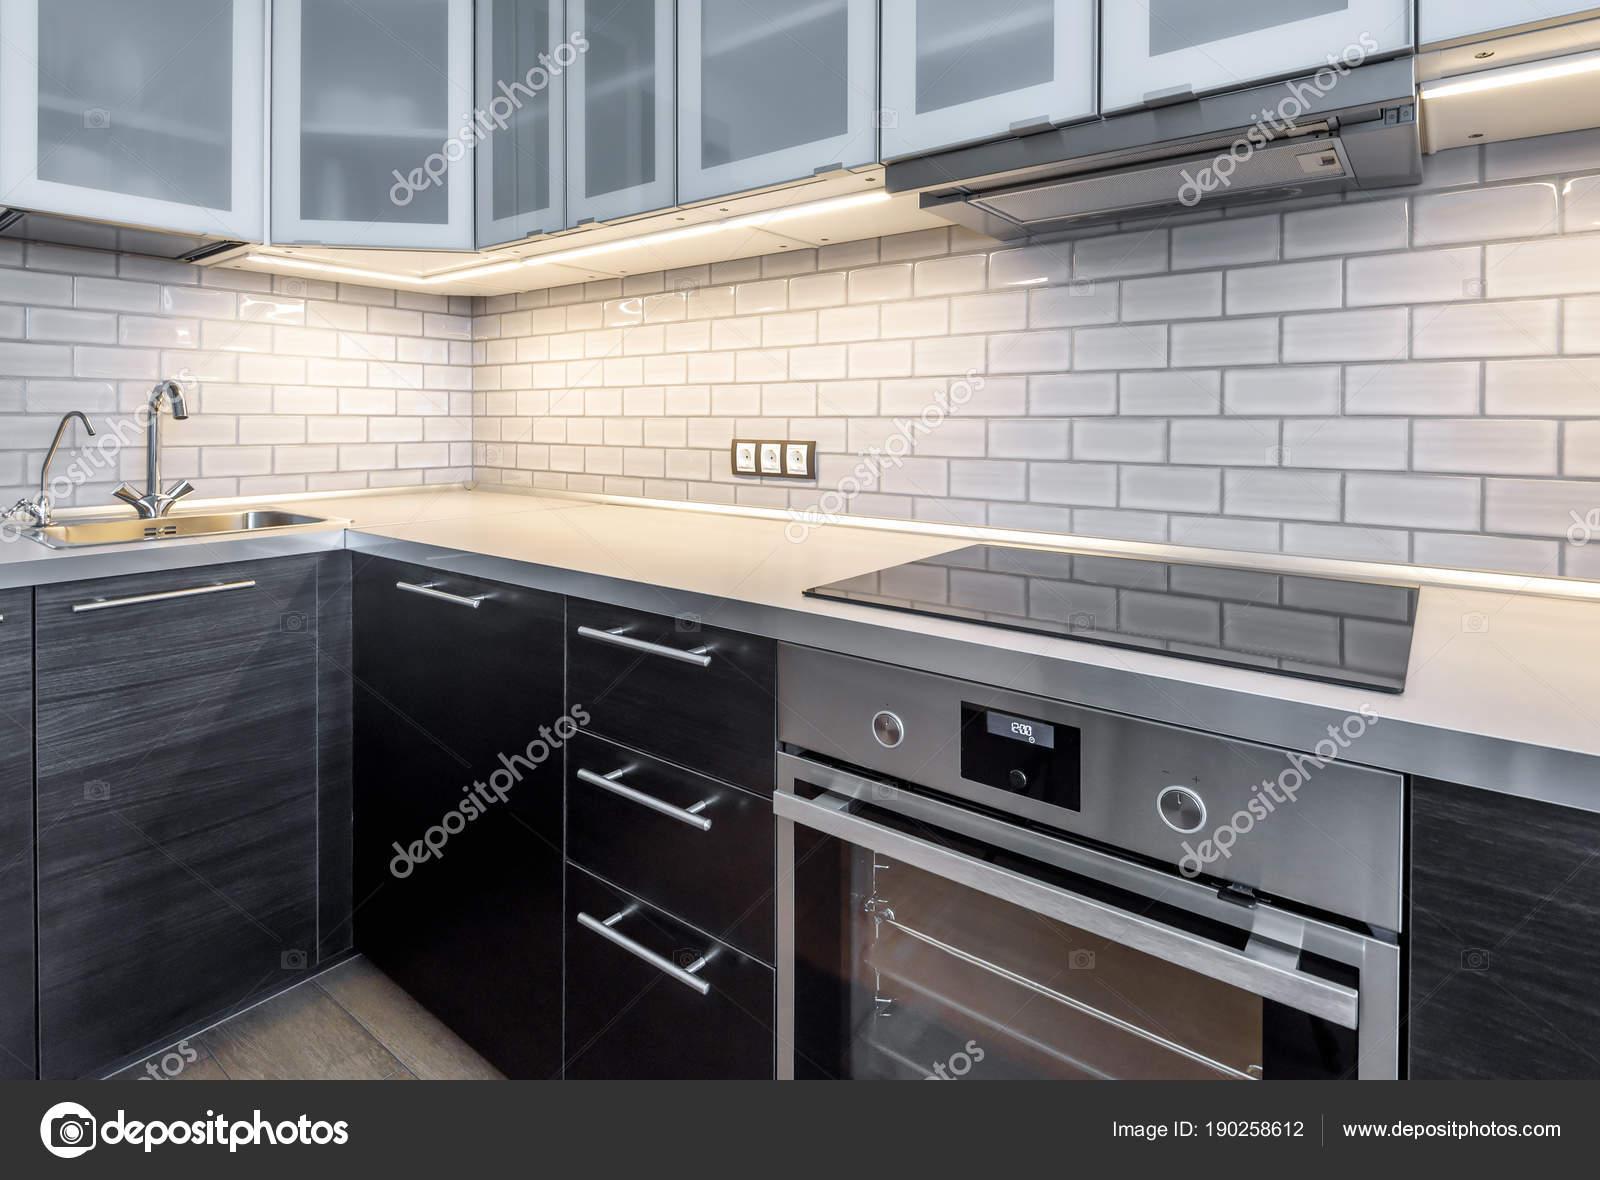 farm kitchen sink flooring 厨房内饰与照明 图库照片 c scaliger 190258612